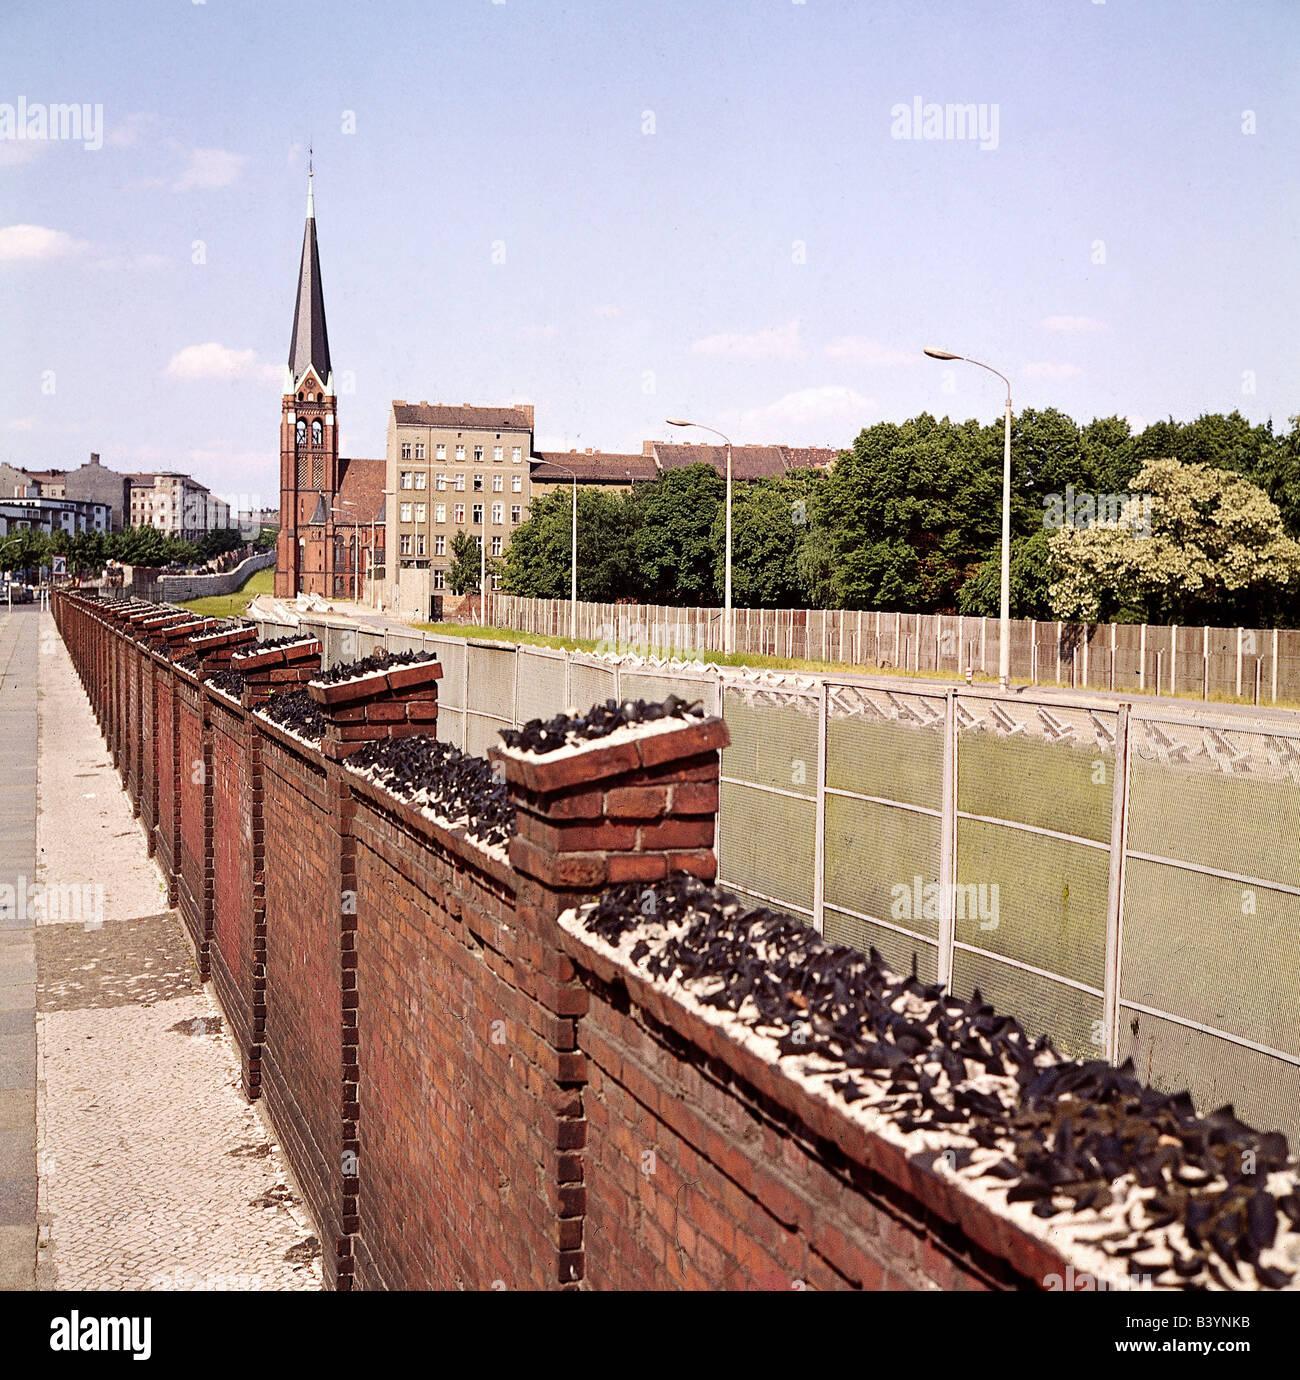 Berlin Wall 1970s Stock Photos & Berlin Wall 1970s Stock